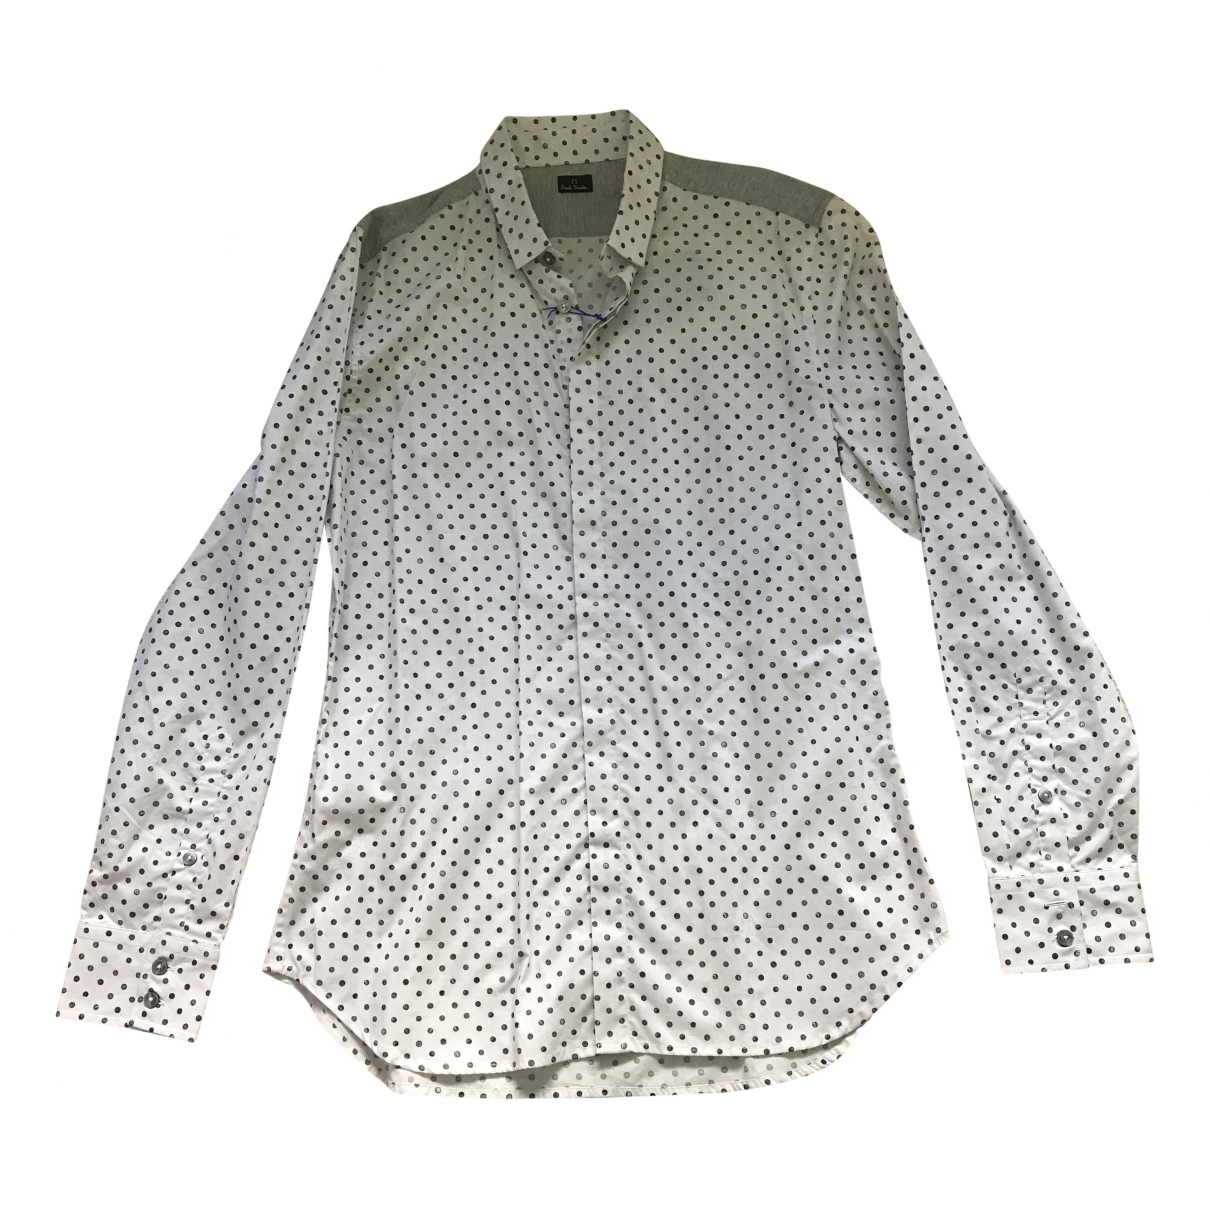 Paul Smith \N Multicolour Cotton Shirts for Men M International